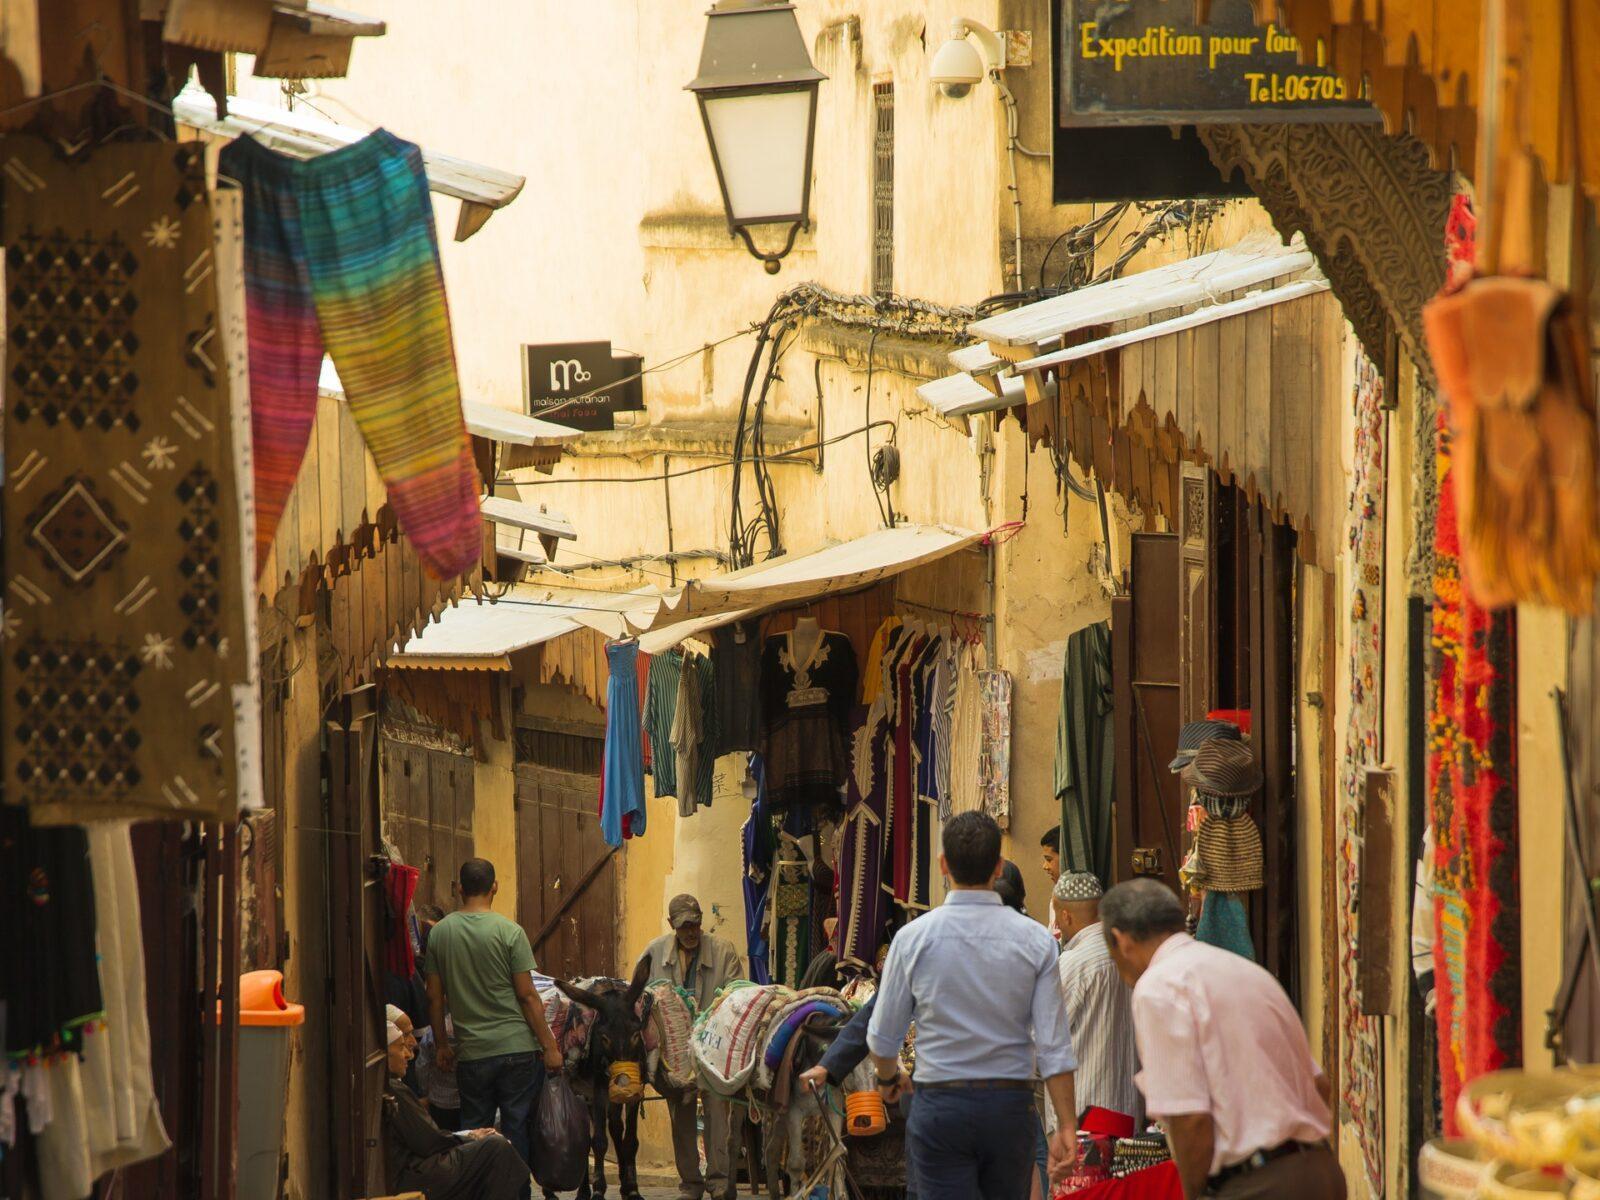 pexels ryutaro tsukata 5472511 1 1536x1152 - Guide Morocco Tours